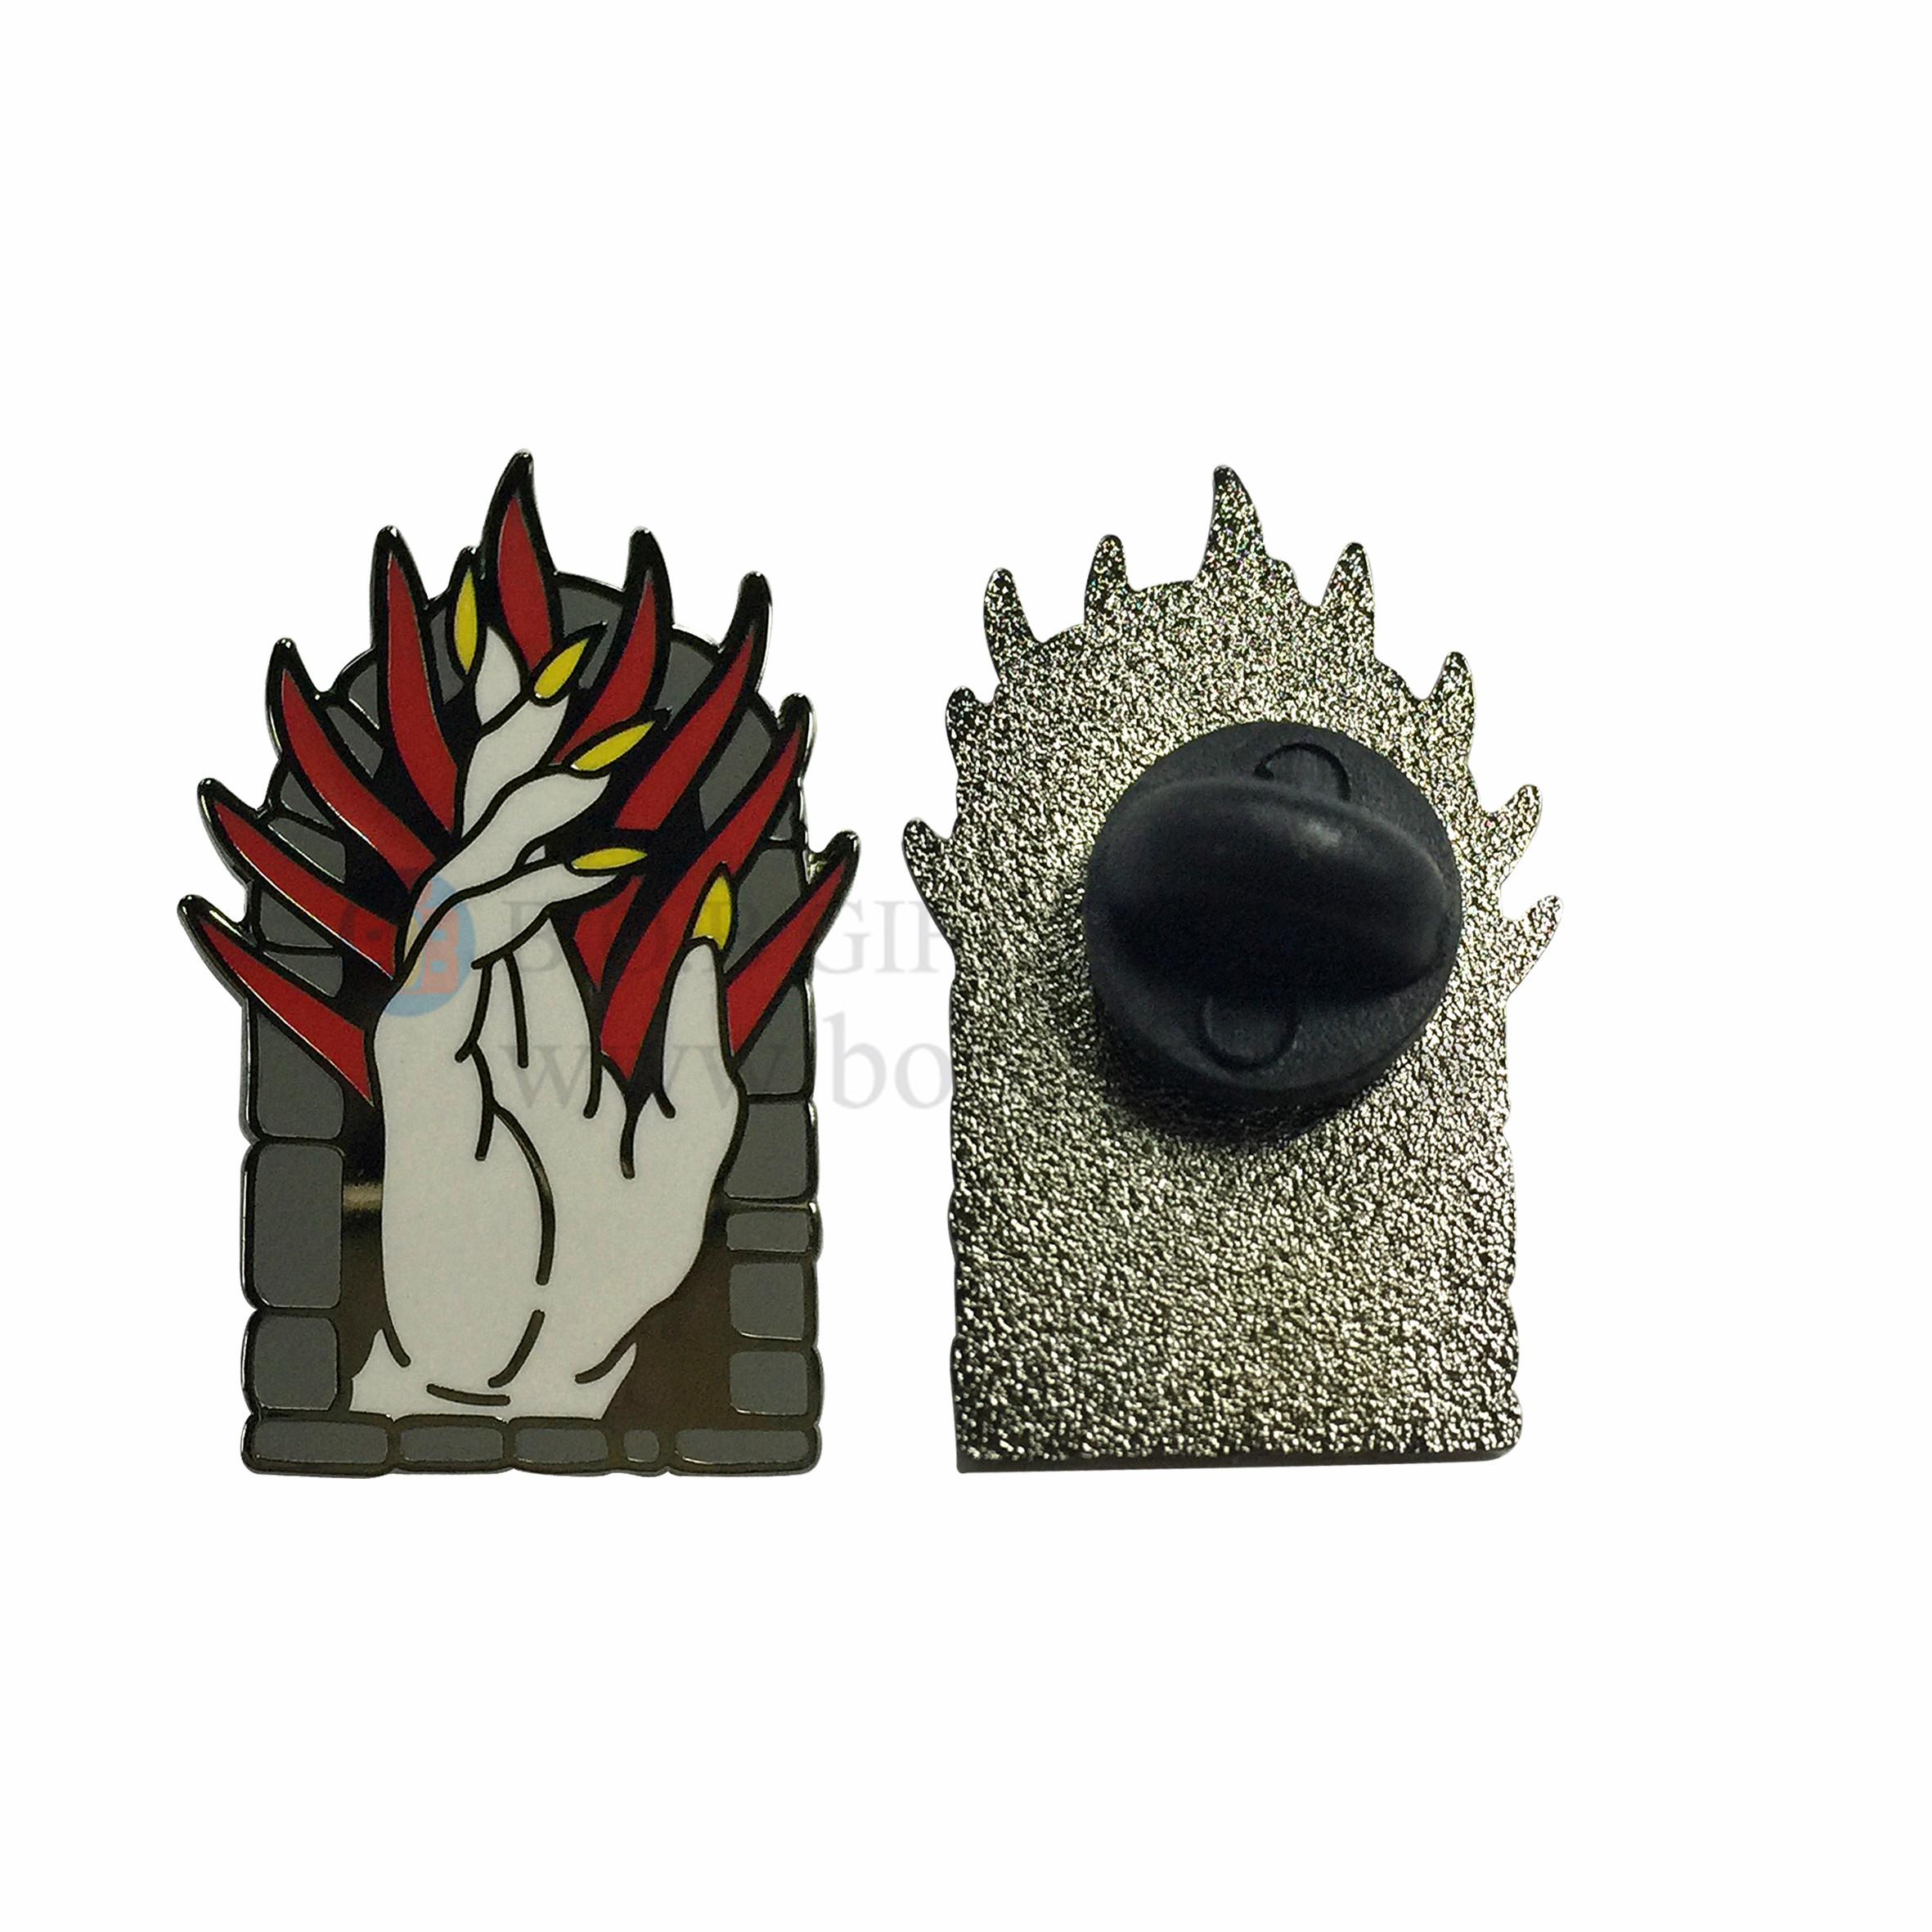 Metal Cloisonne Pins